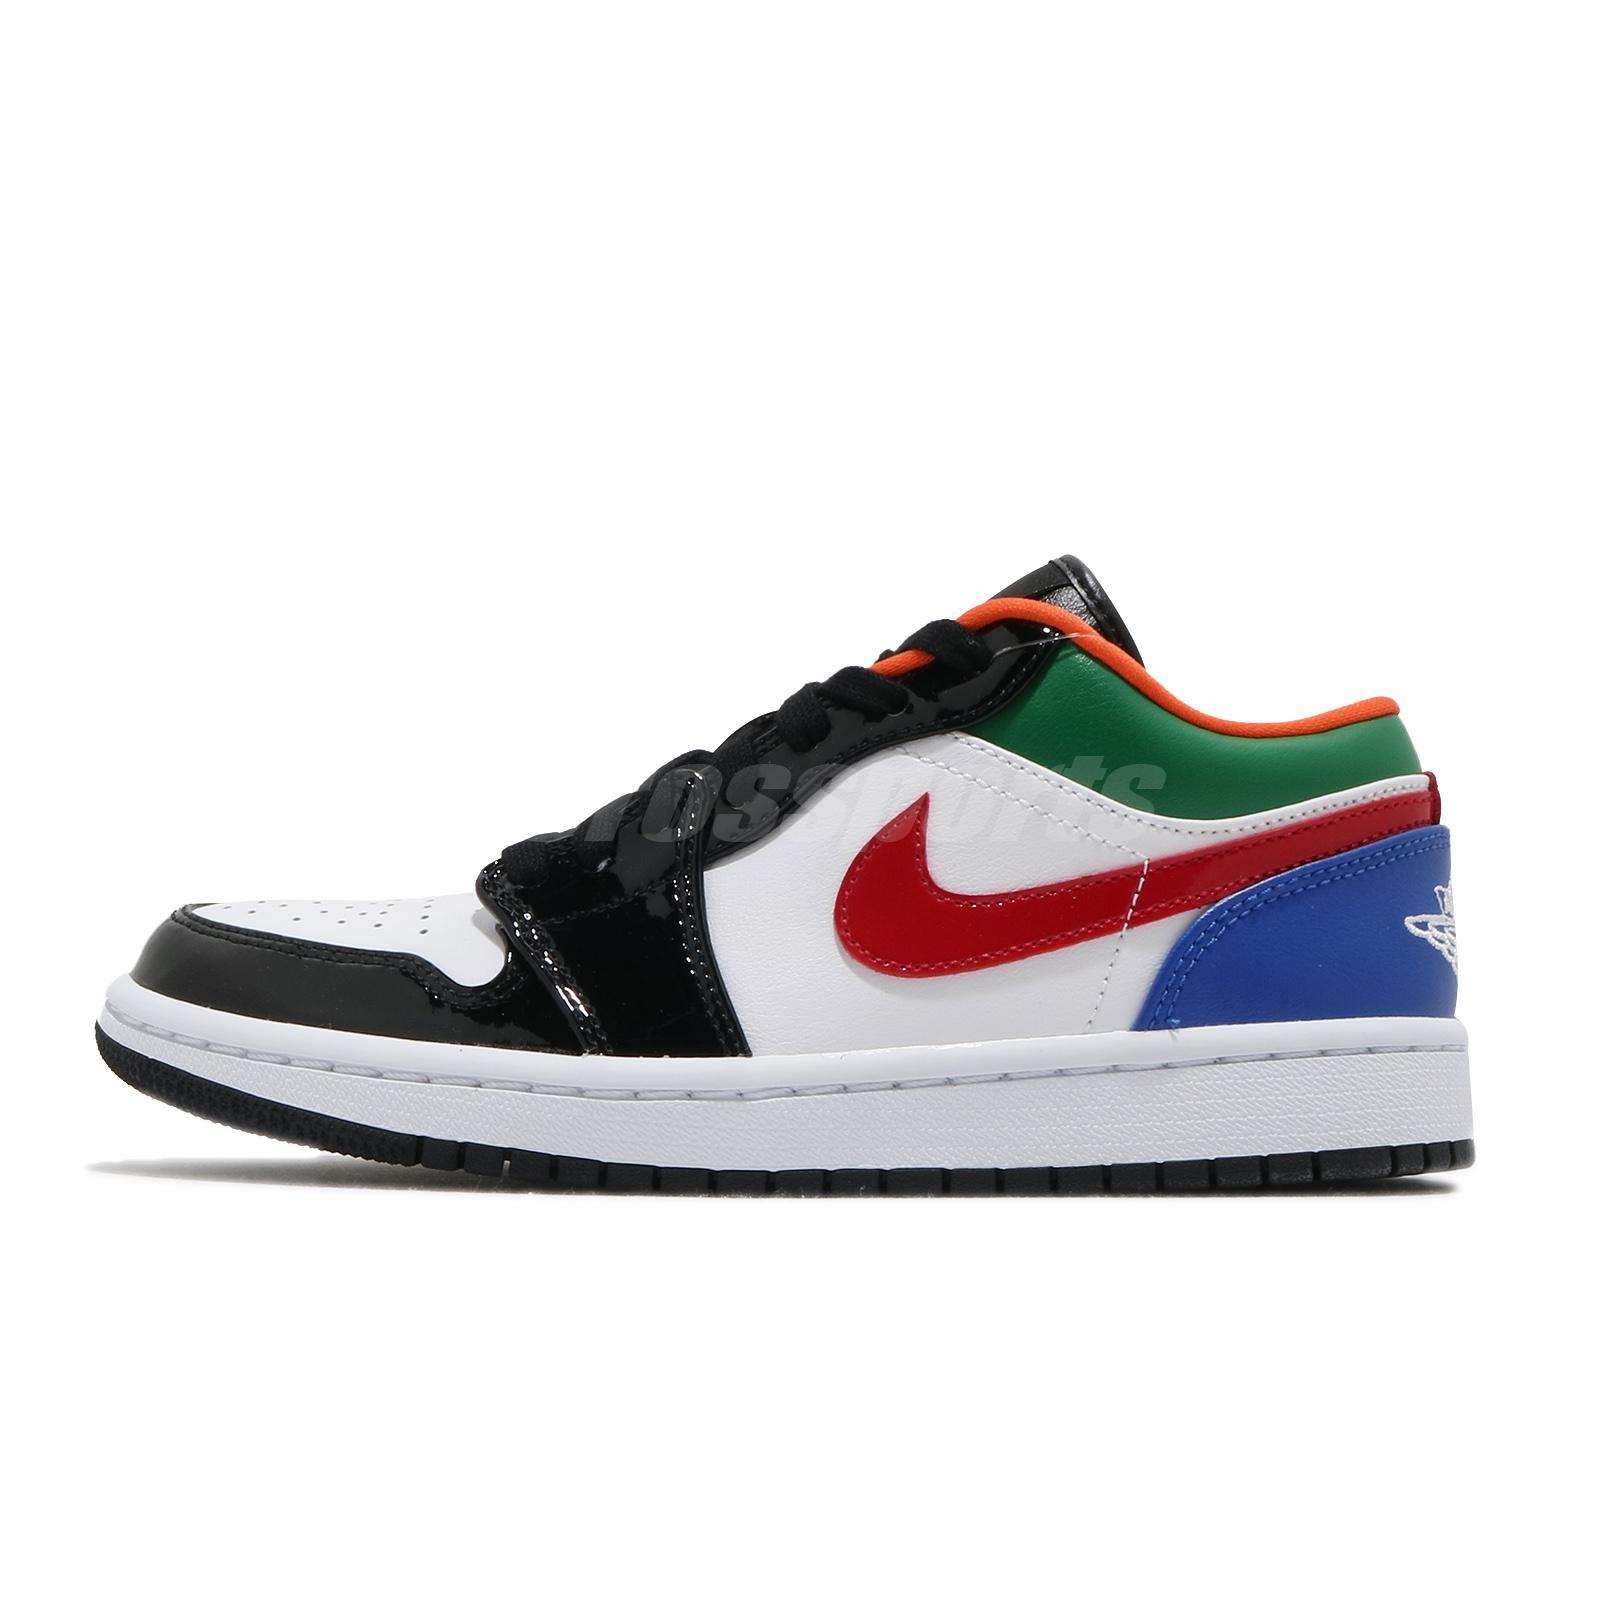 Nike Air Jordan 1 Low Se Multi Color Black Toe White Red Women